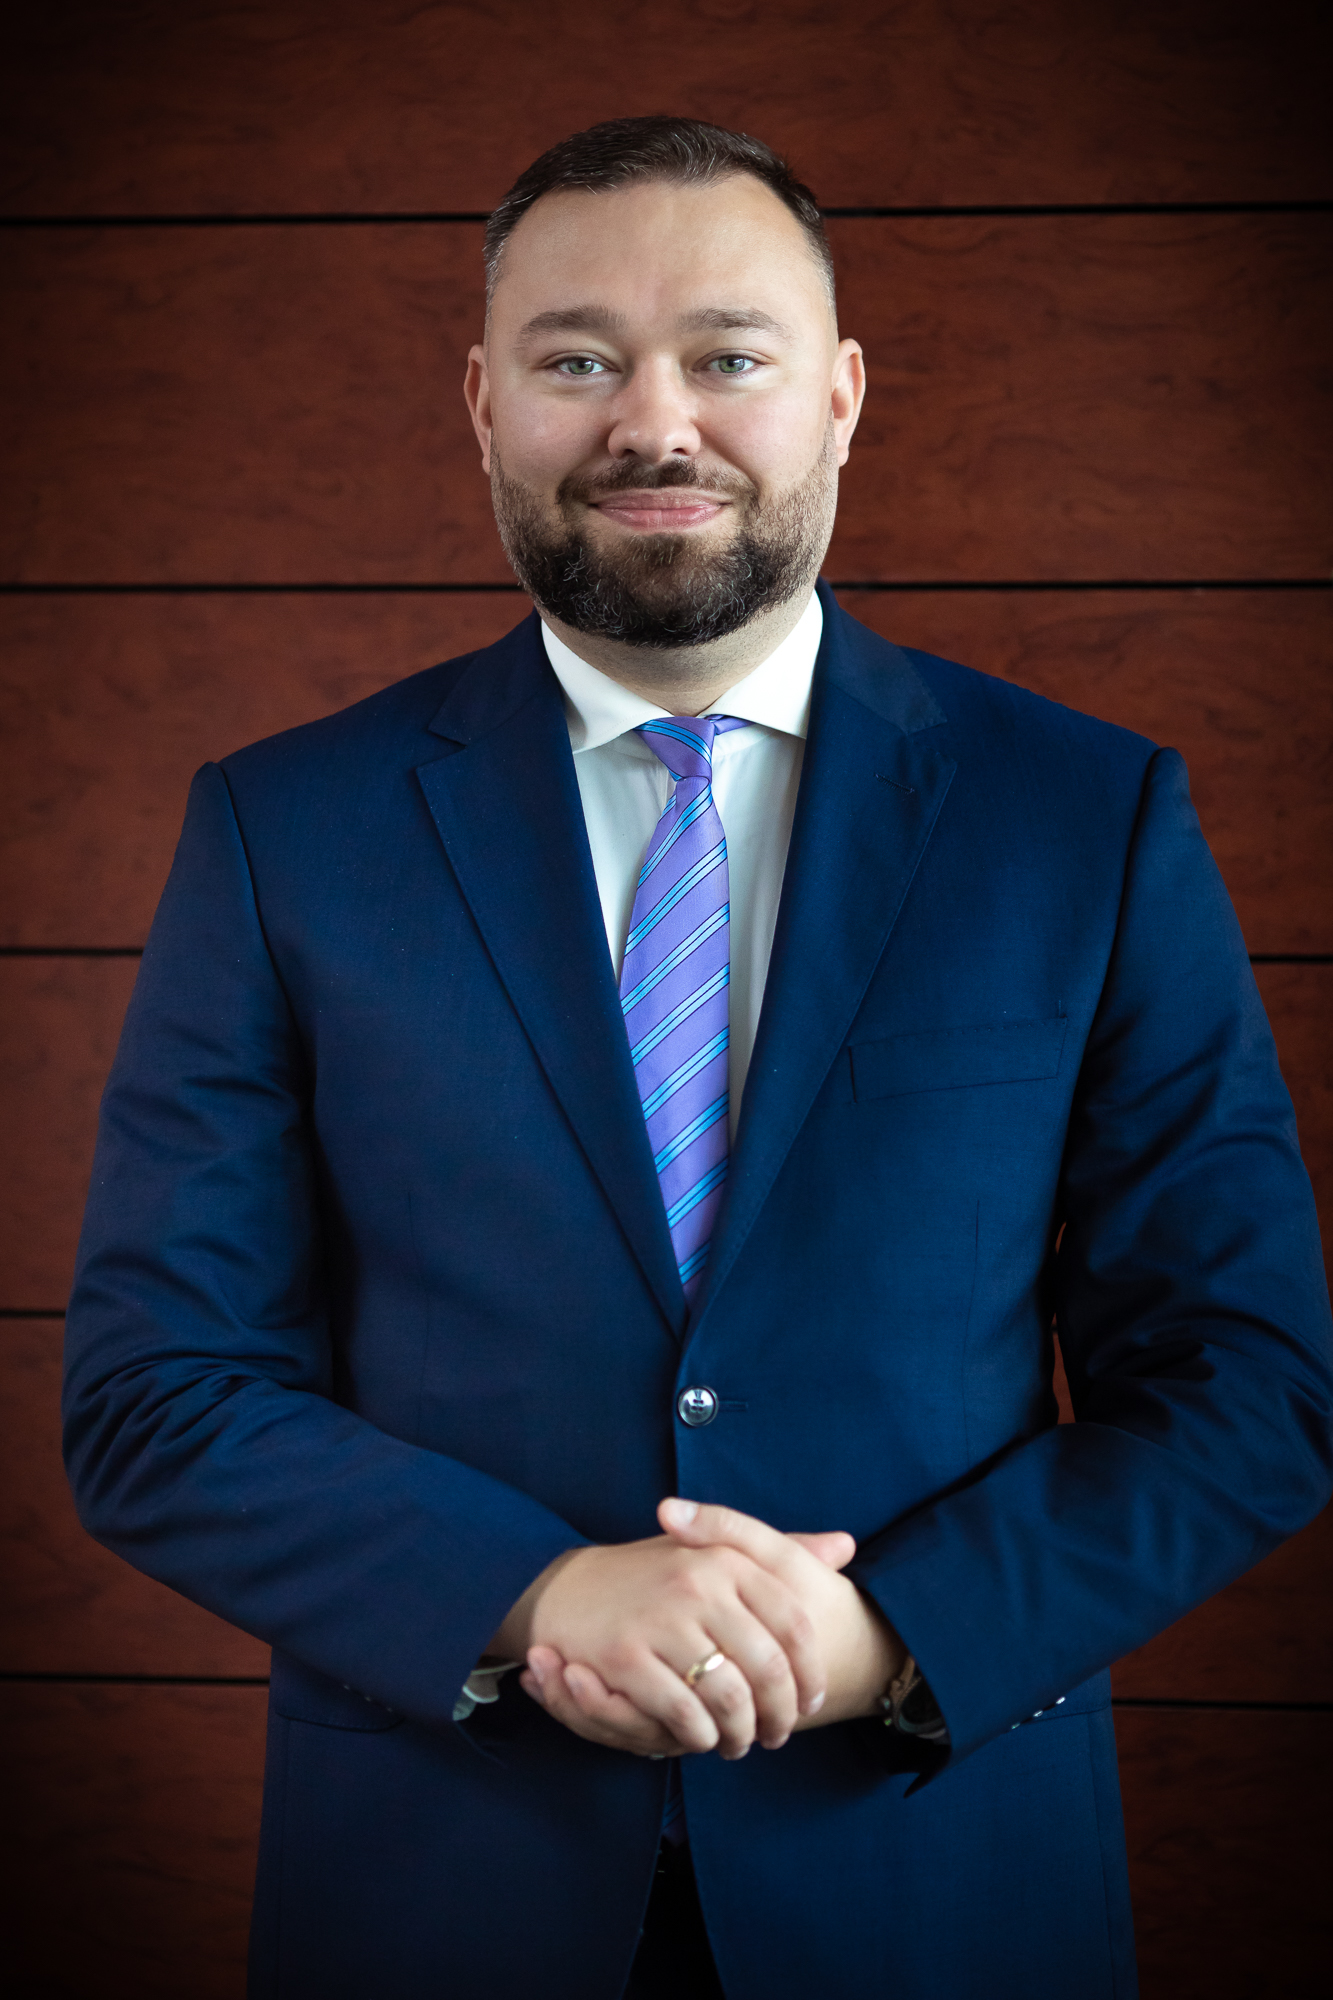 Kancelaria Adwokacka Adwokat Konrad Kozioł, MBA